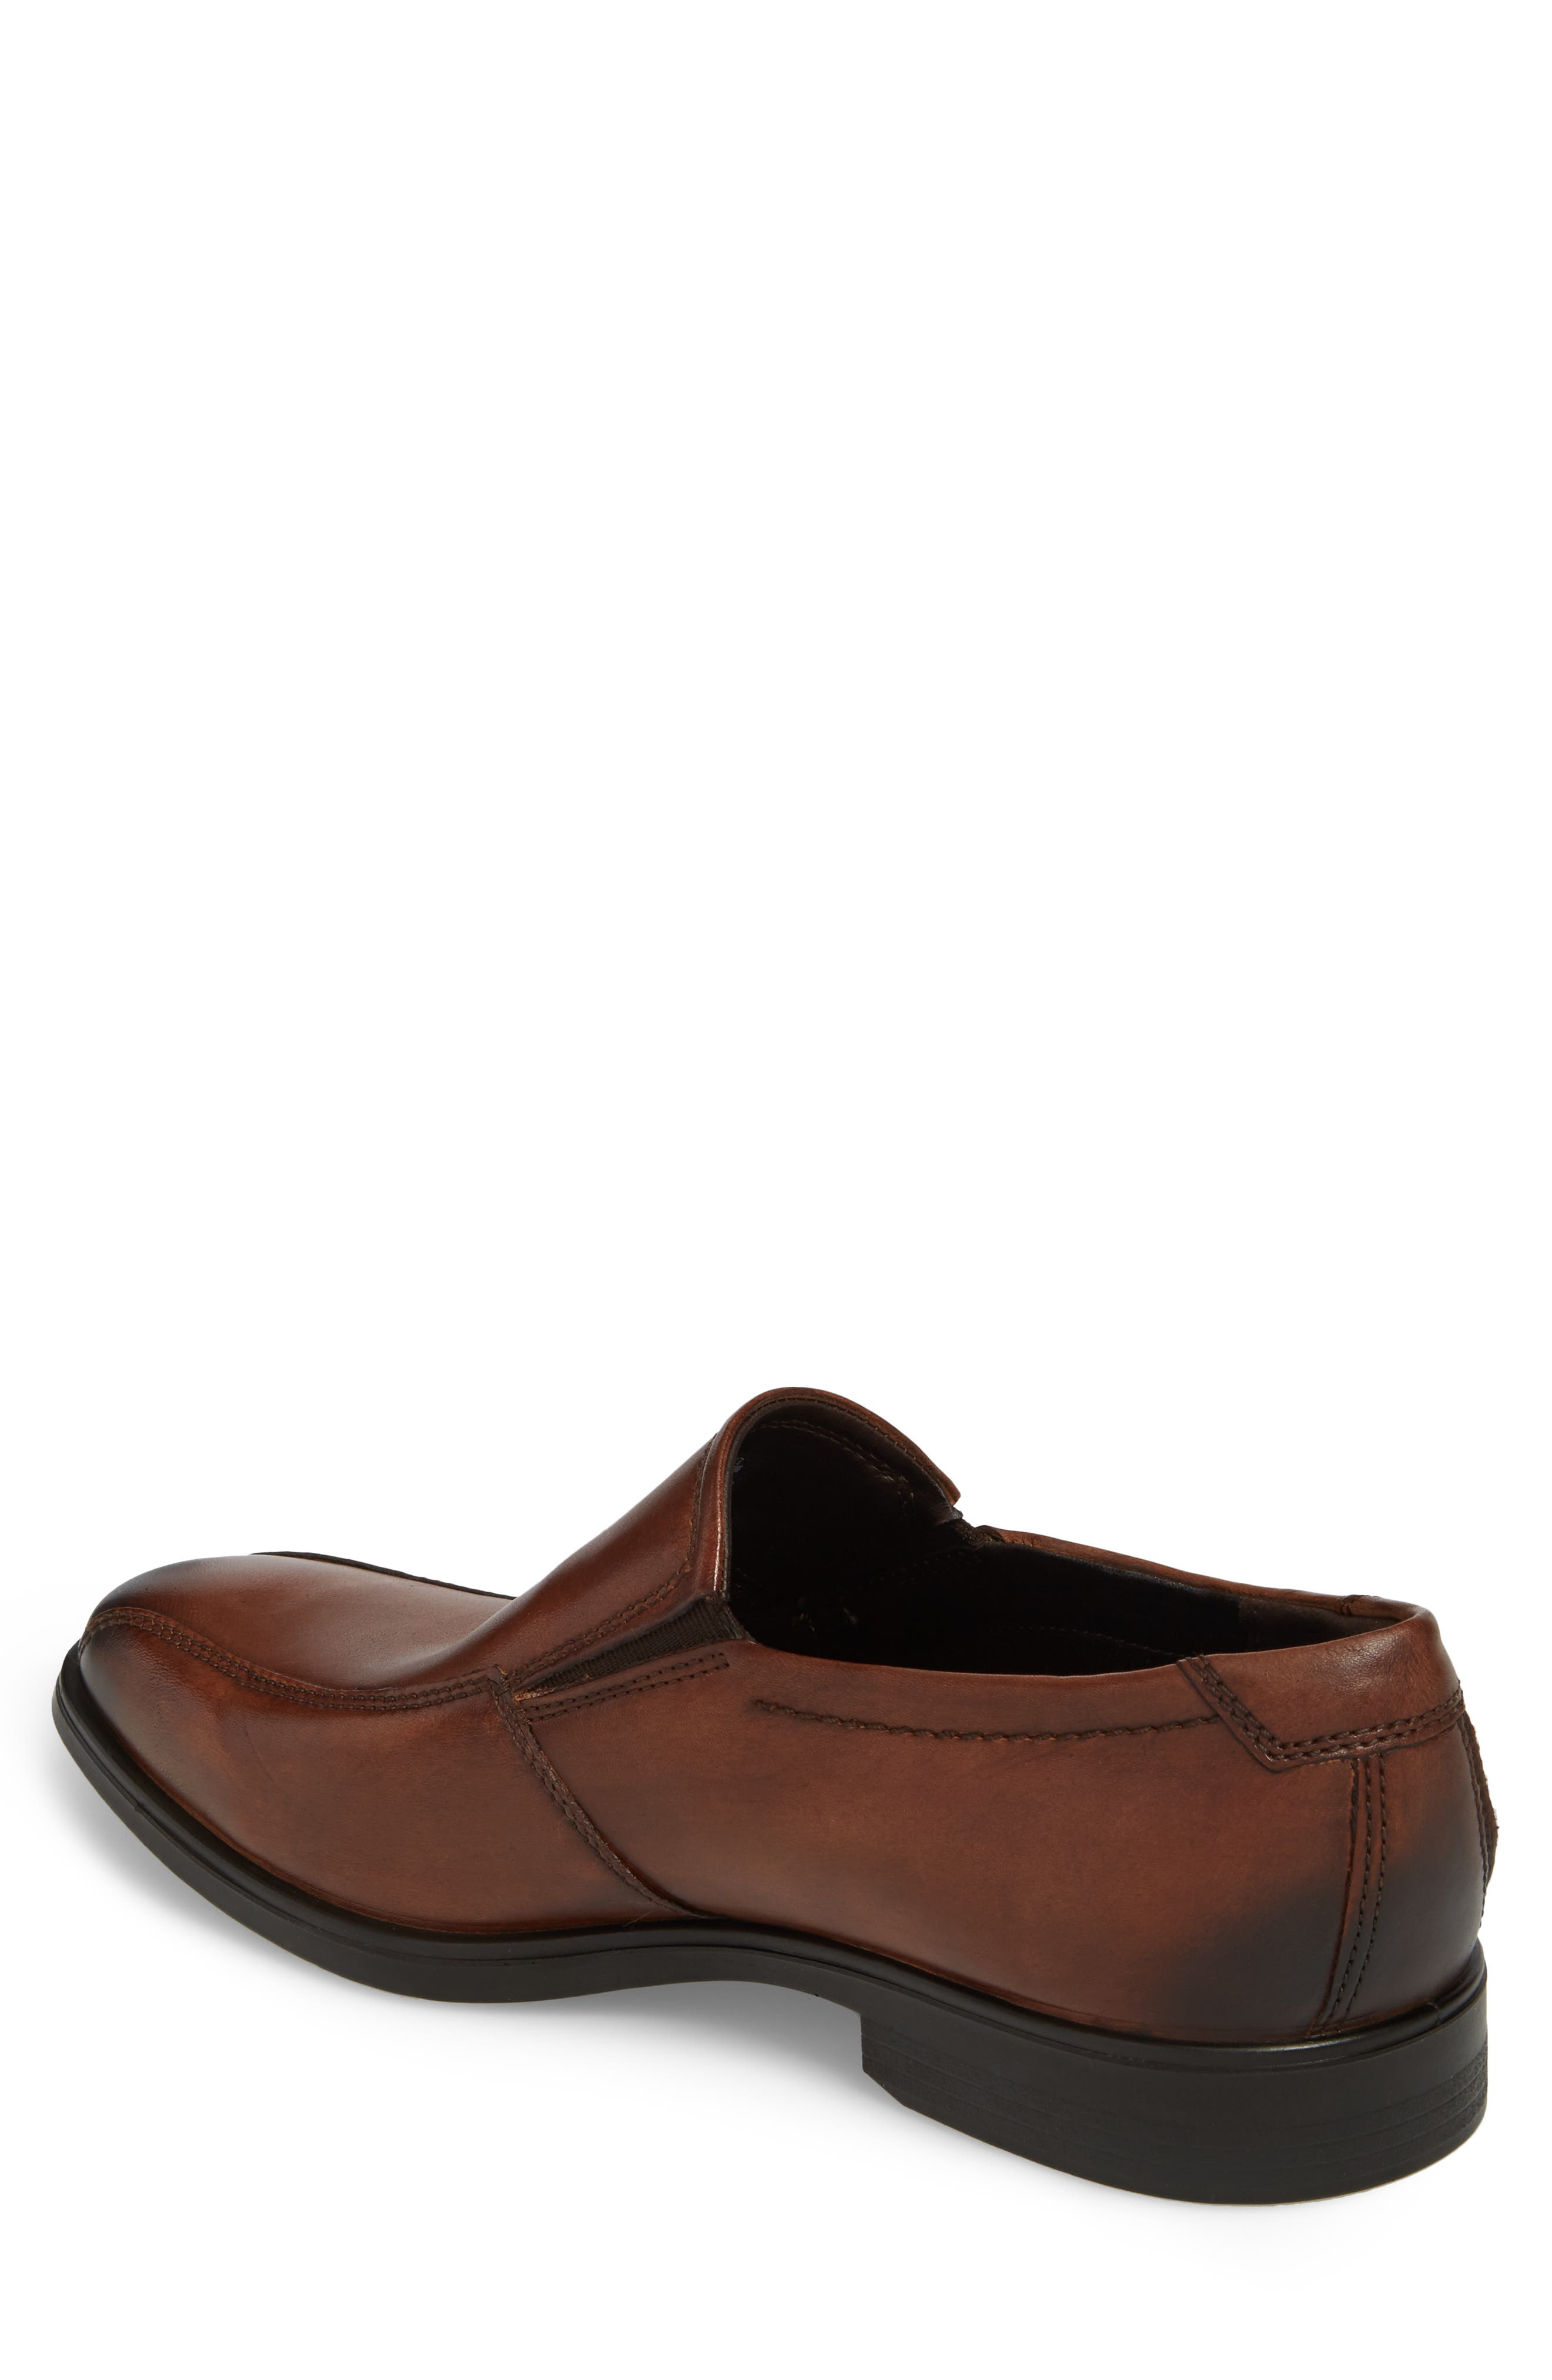 Melbourne Venetian Loafer,                             Alternate thumbnail 2, color,                             Amber Leather